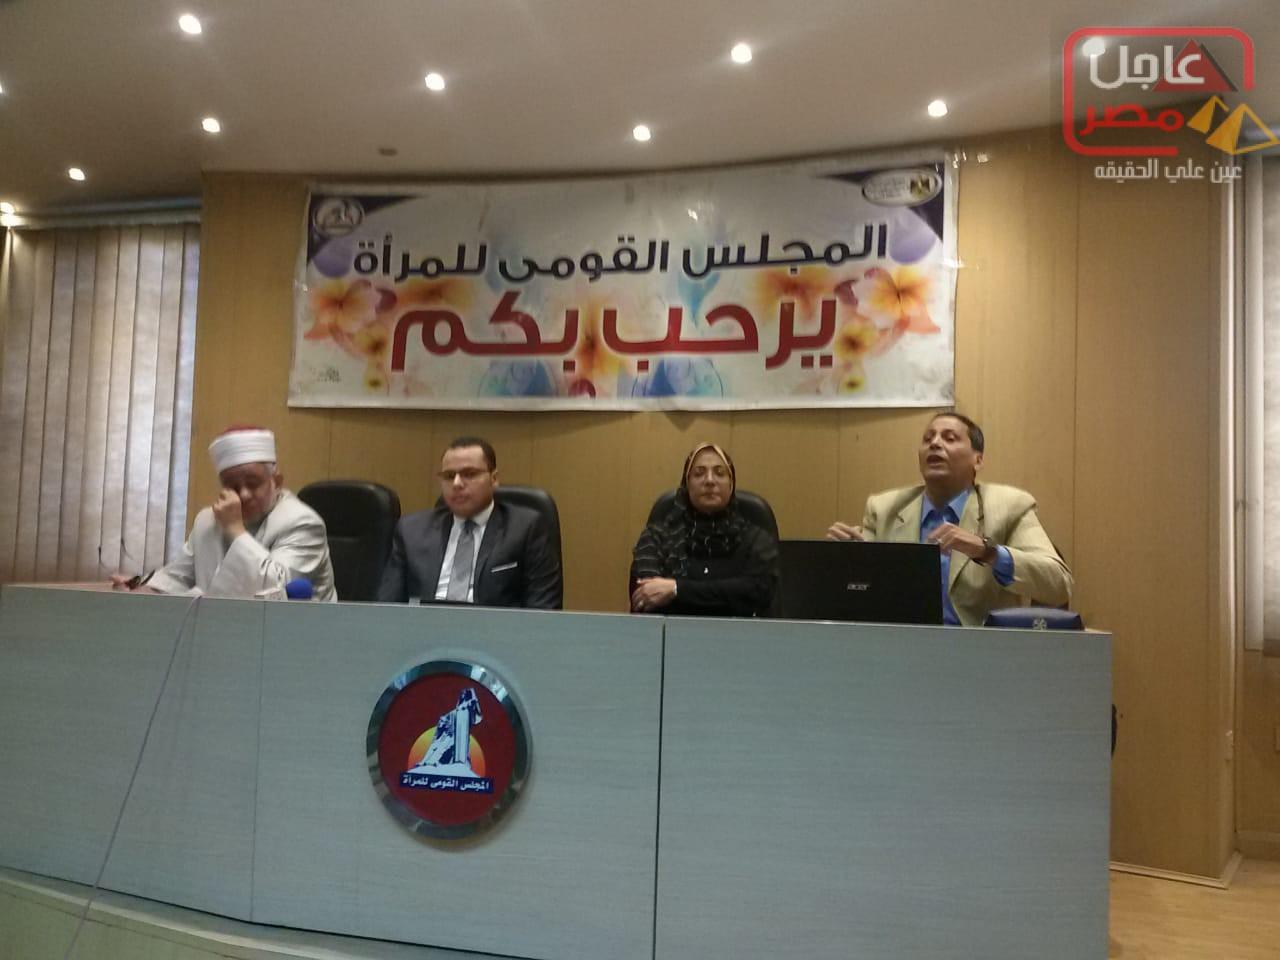 Photo of المجلس القومى للمرأة بقنا تعقد ندوة حول ( العنف ضد المرأة )